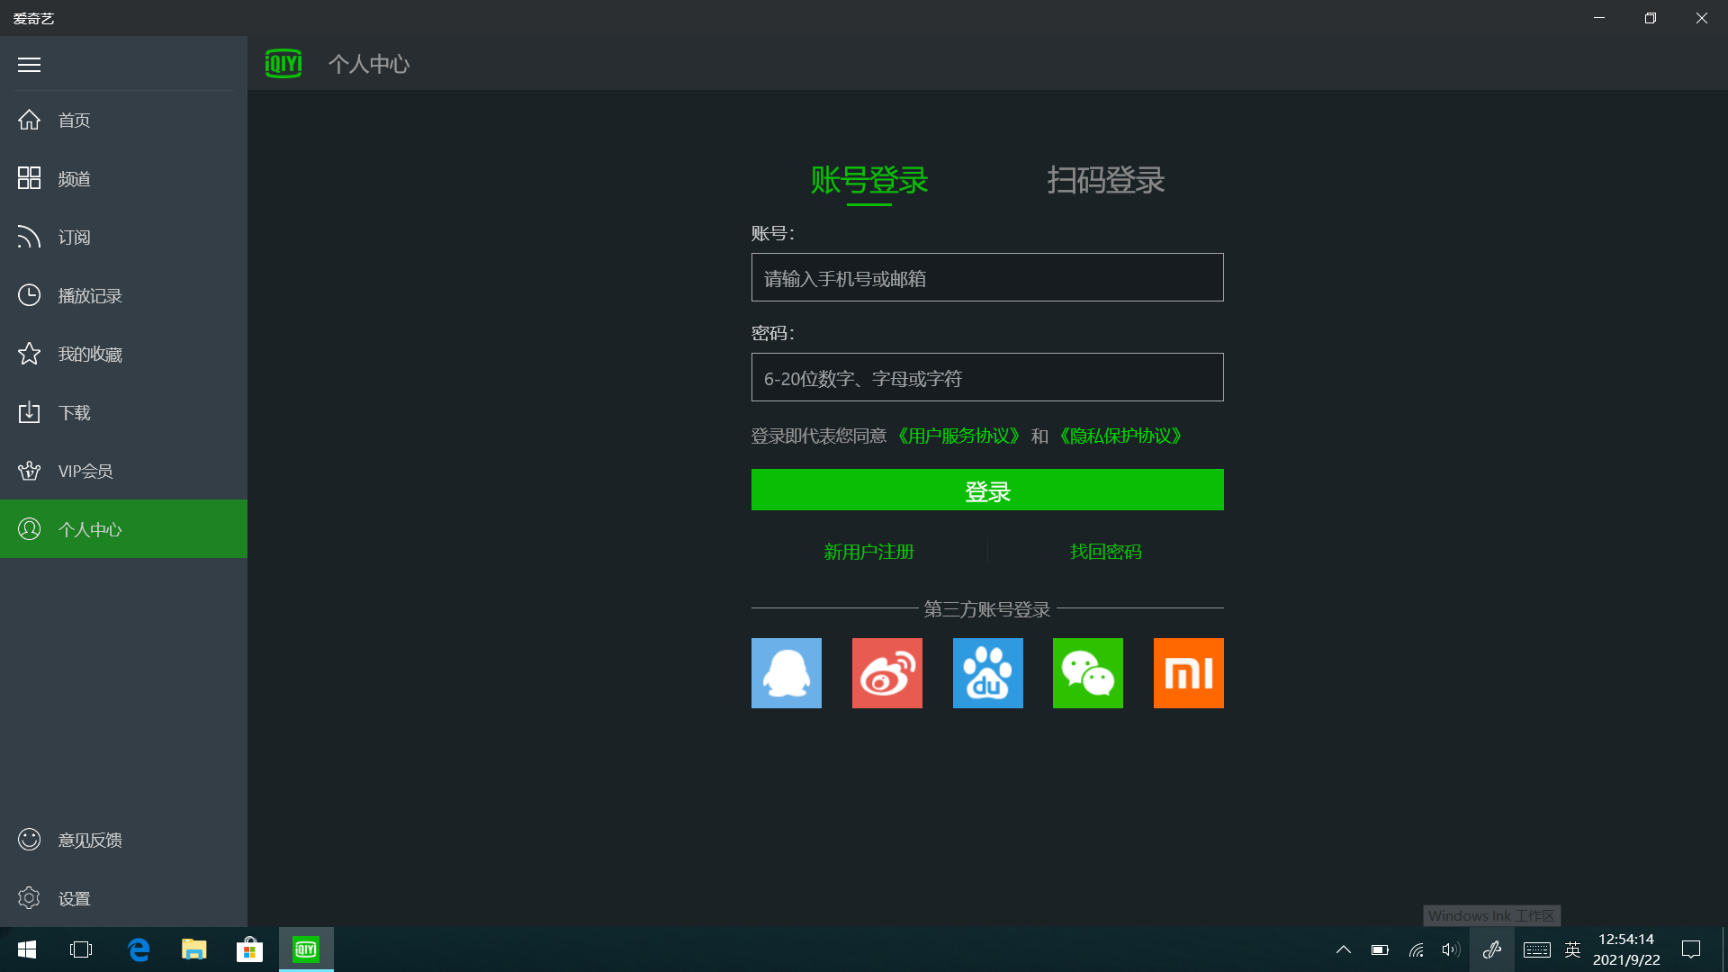 Surface2安装Win10后爱奇艺视频软件正常